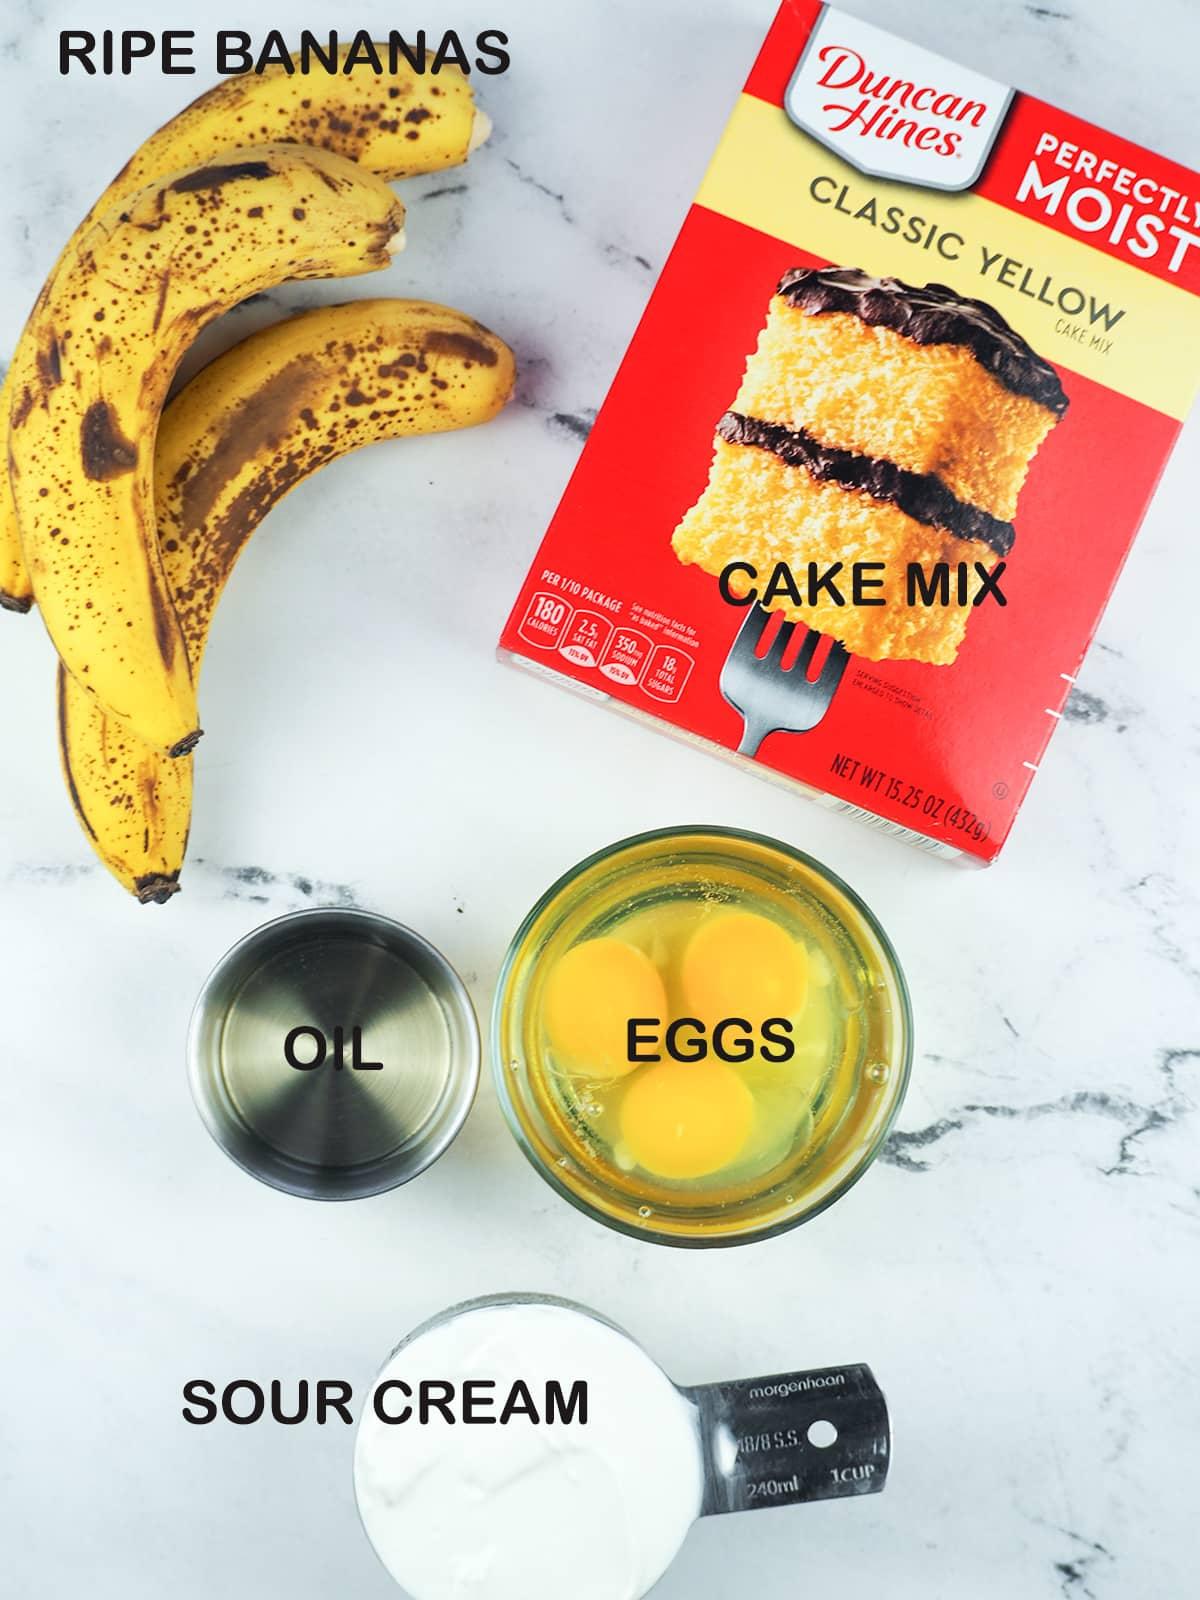 ingredients for banana sour cream cake